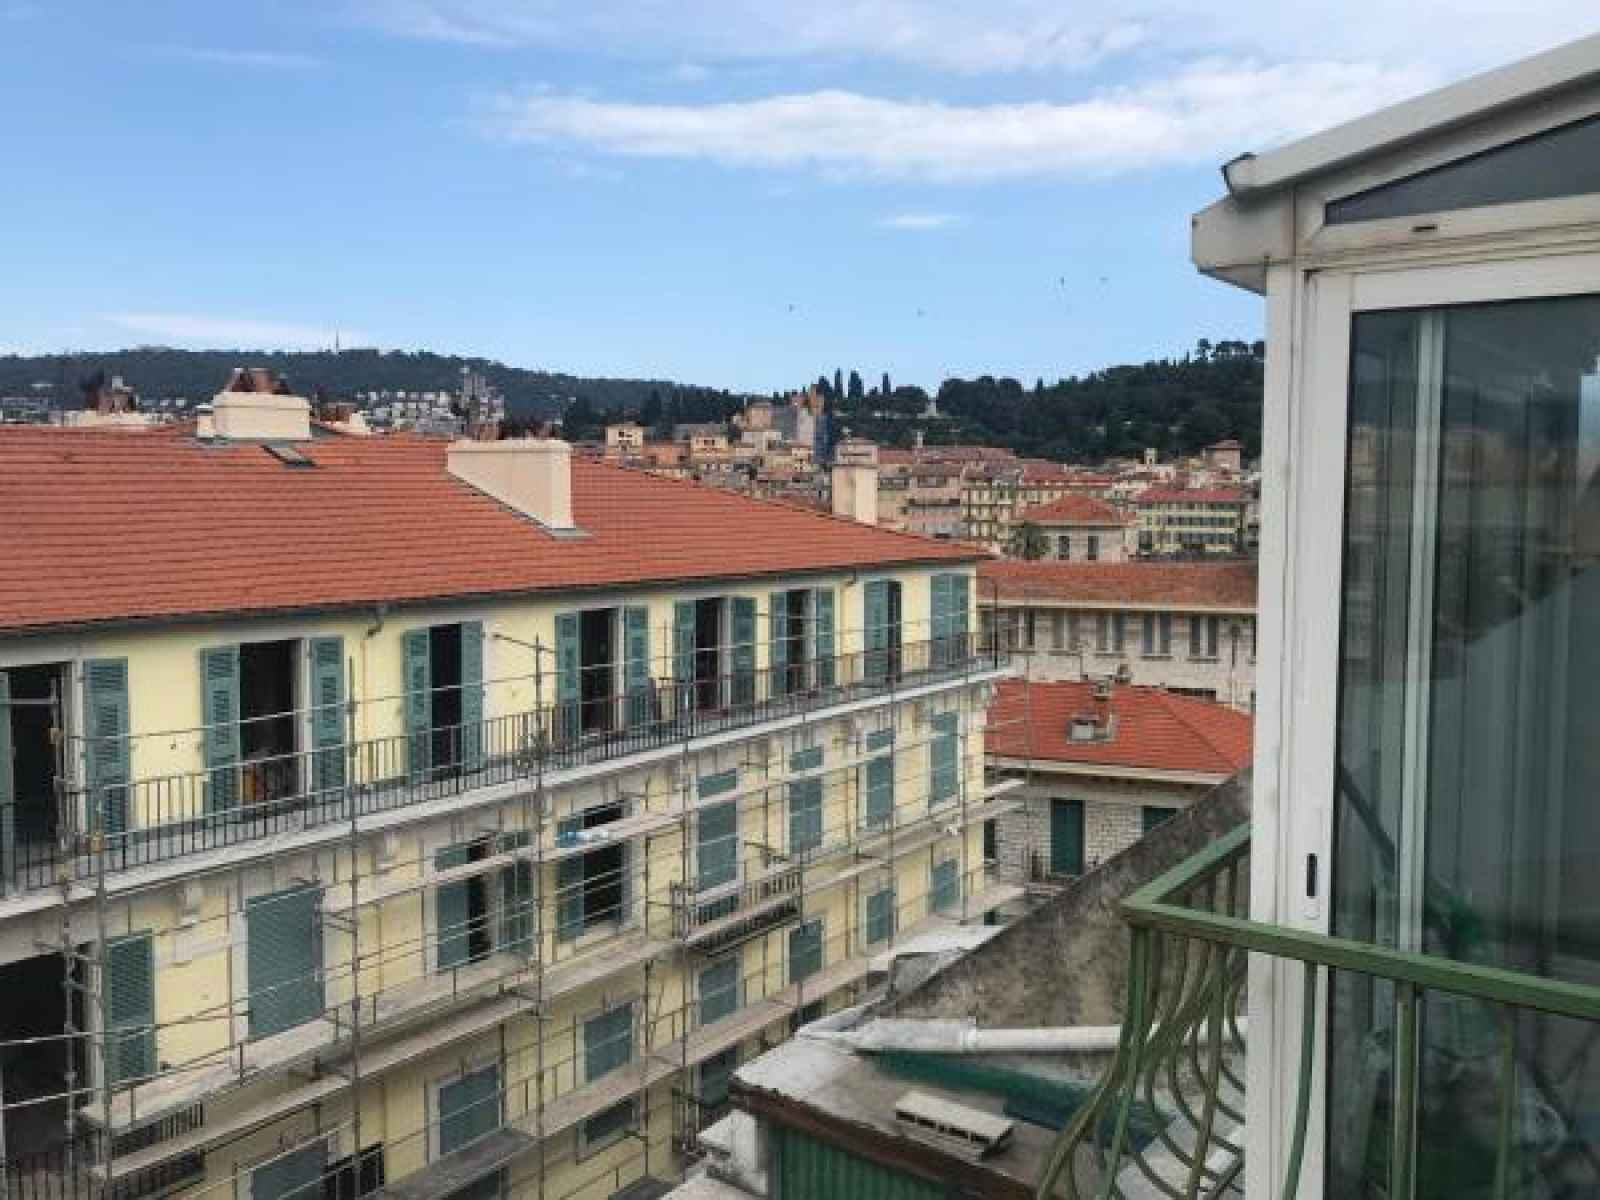 Pièces Vente Immobilier Nice WilsonDinamy Appartement 3 lJcK1F